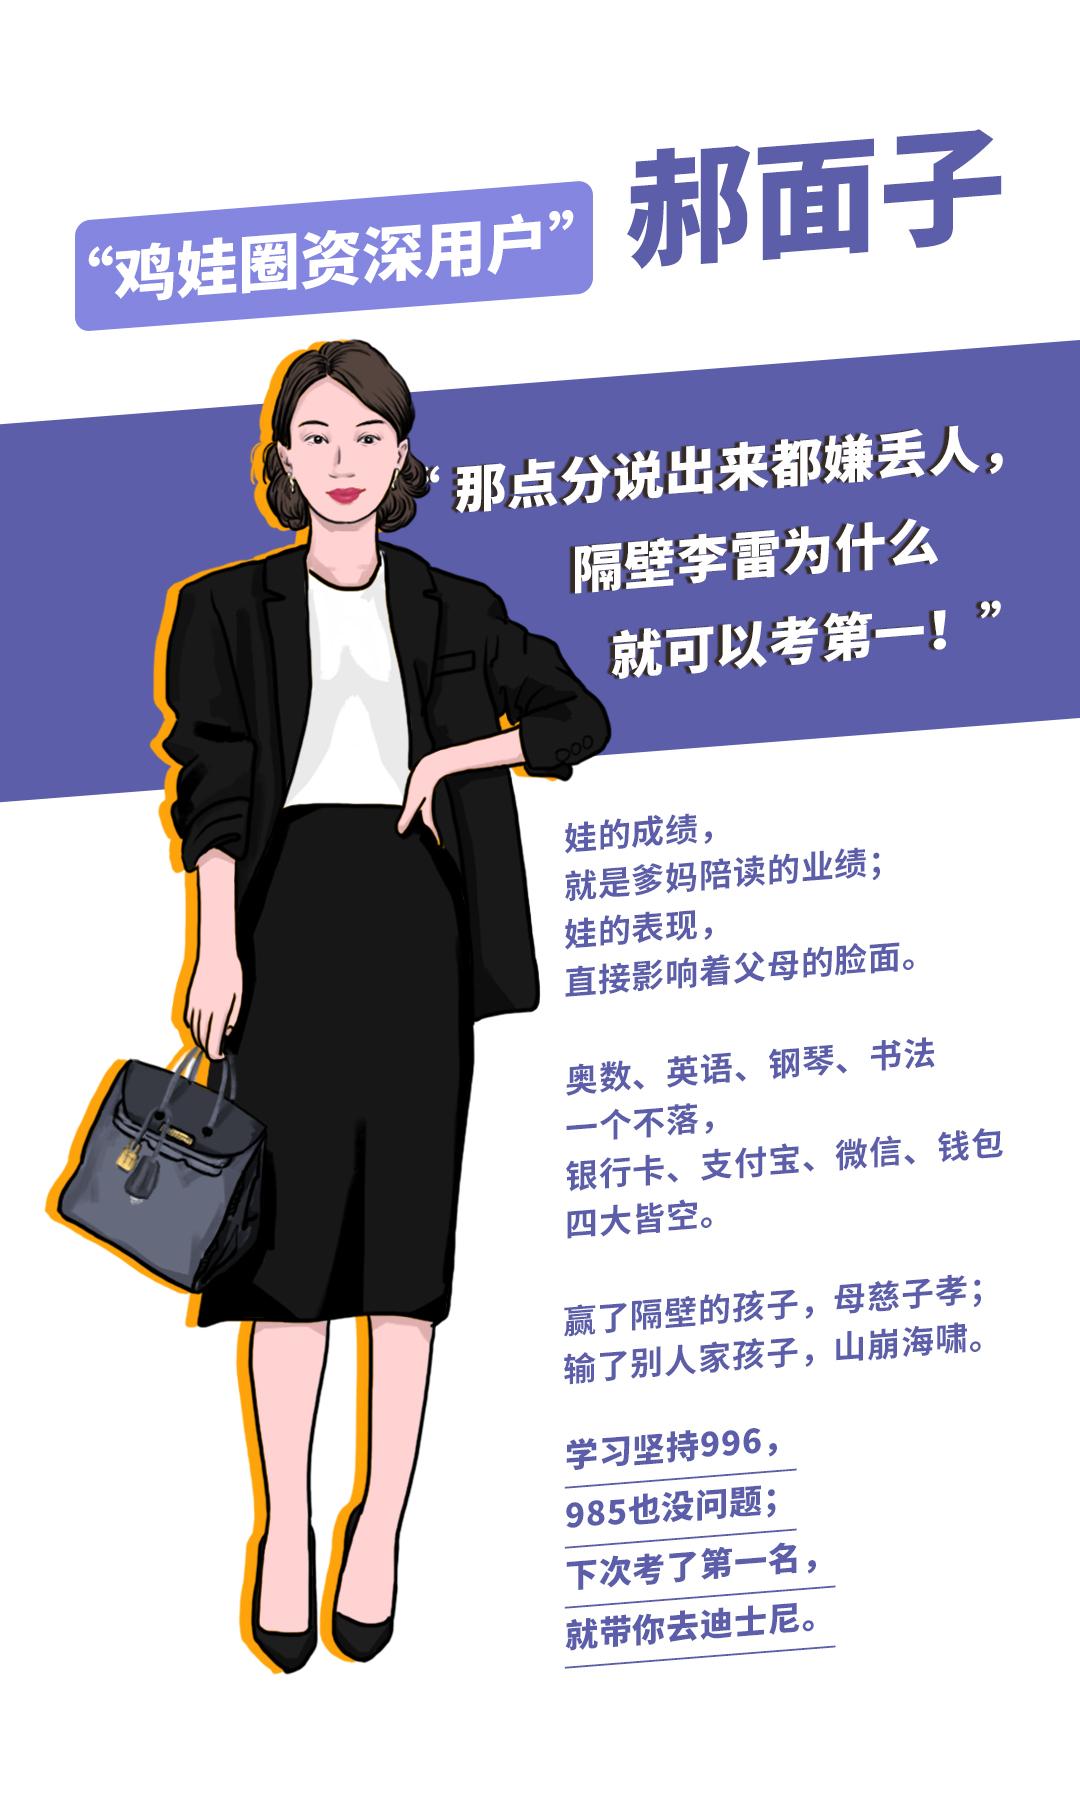 https://level8cases.oss-cn-hangzhou.aliyuncs.com/gmt推文配图-11.20-2.0_05-e7ae75e9-88e5-4d9d-a0e7-fdba4221f99d.jpg